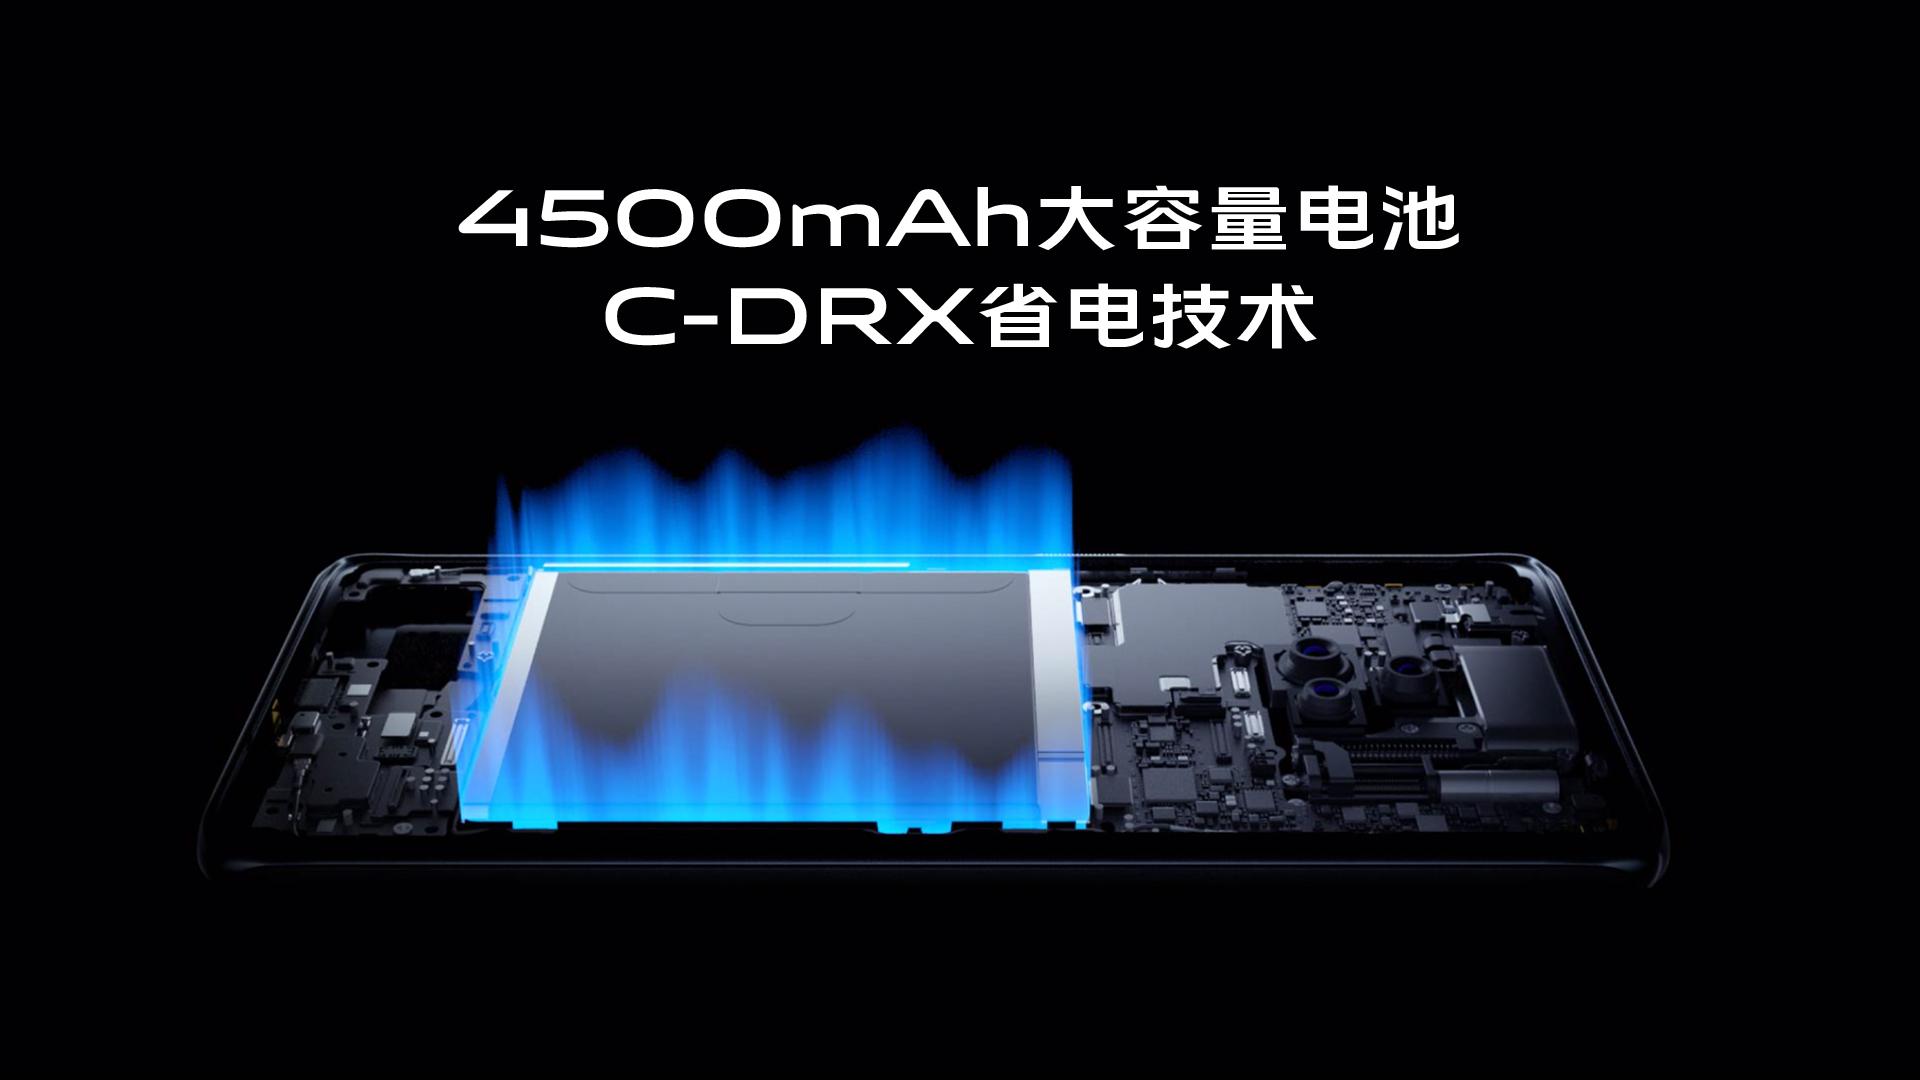 05-4500mAh大容量电池.jpg